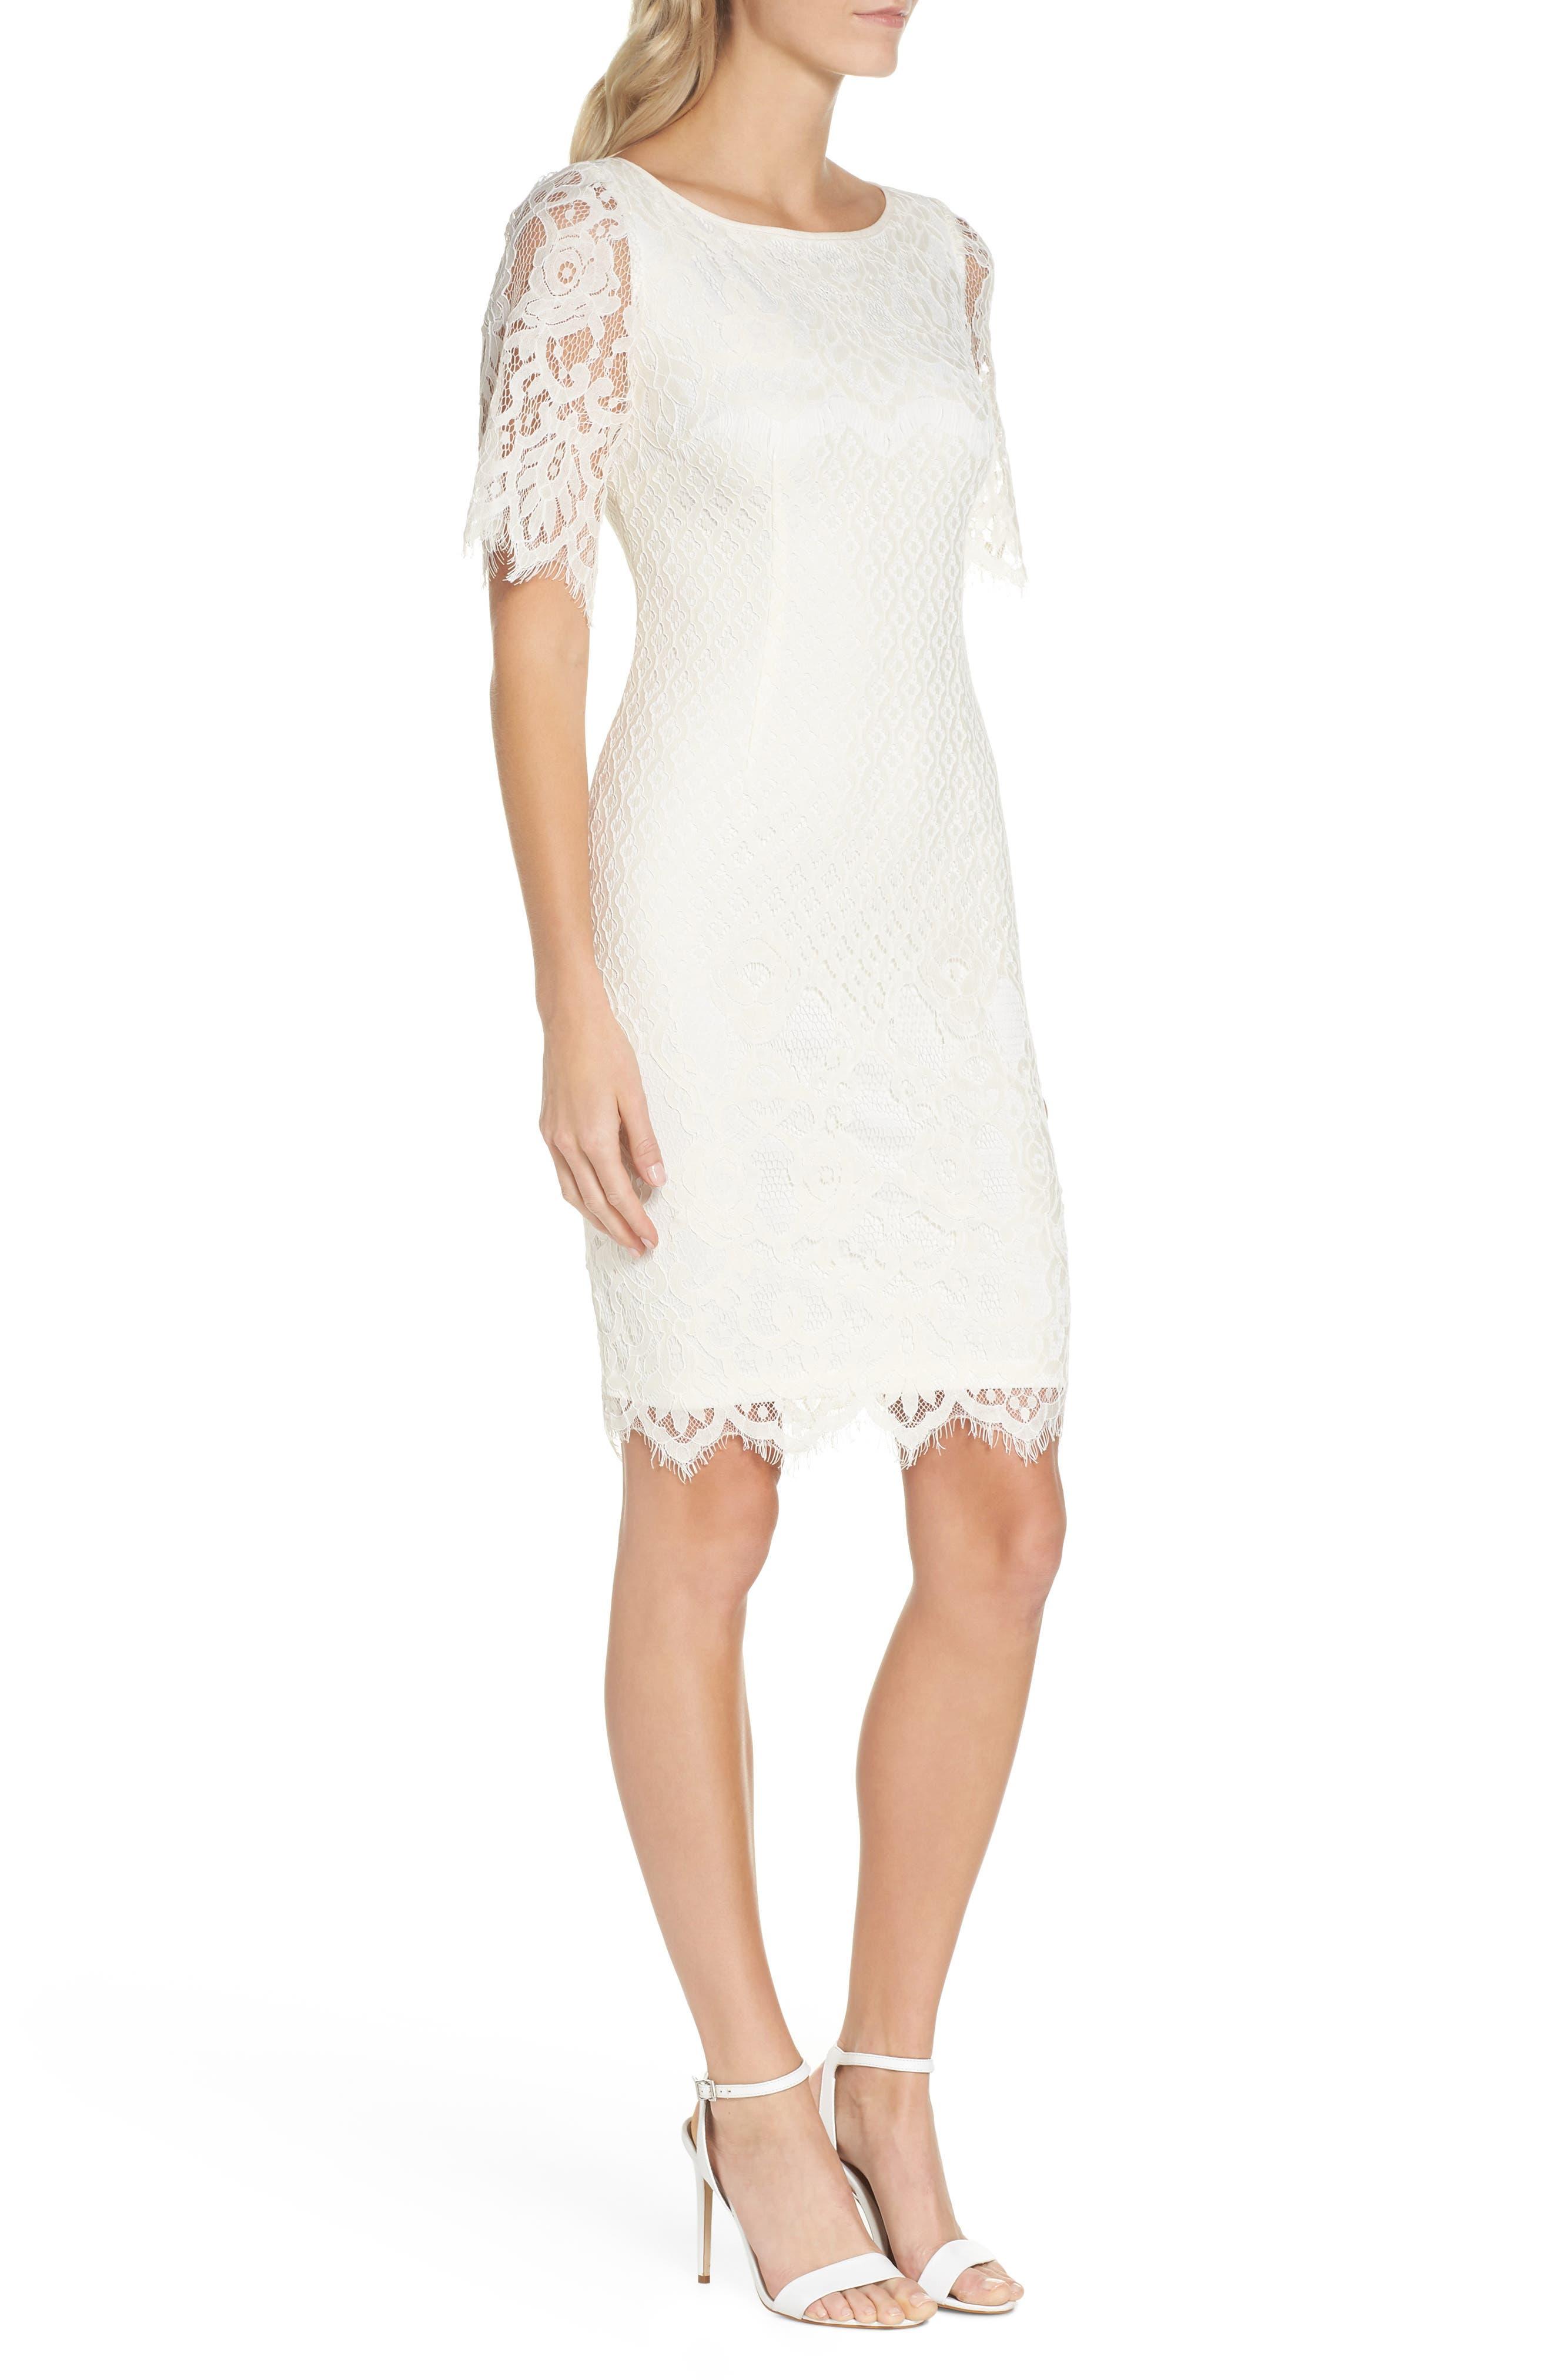 Georgia Scalloped Lace Sheath Dress,                             Alternate thumbnail 3, color,                             904